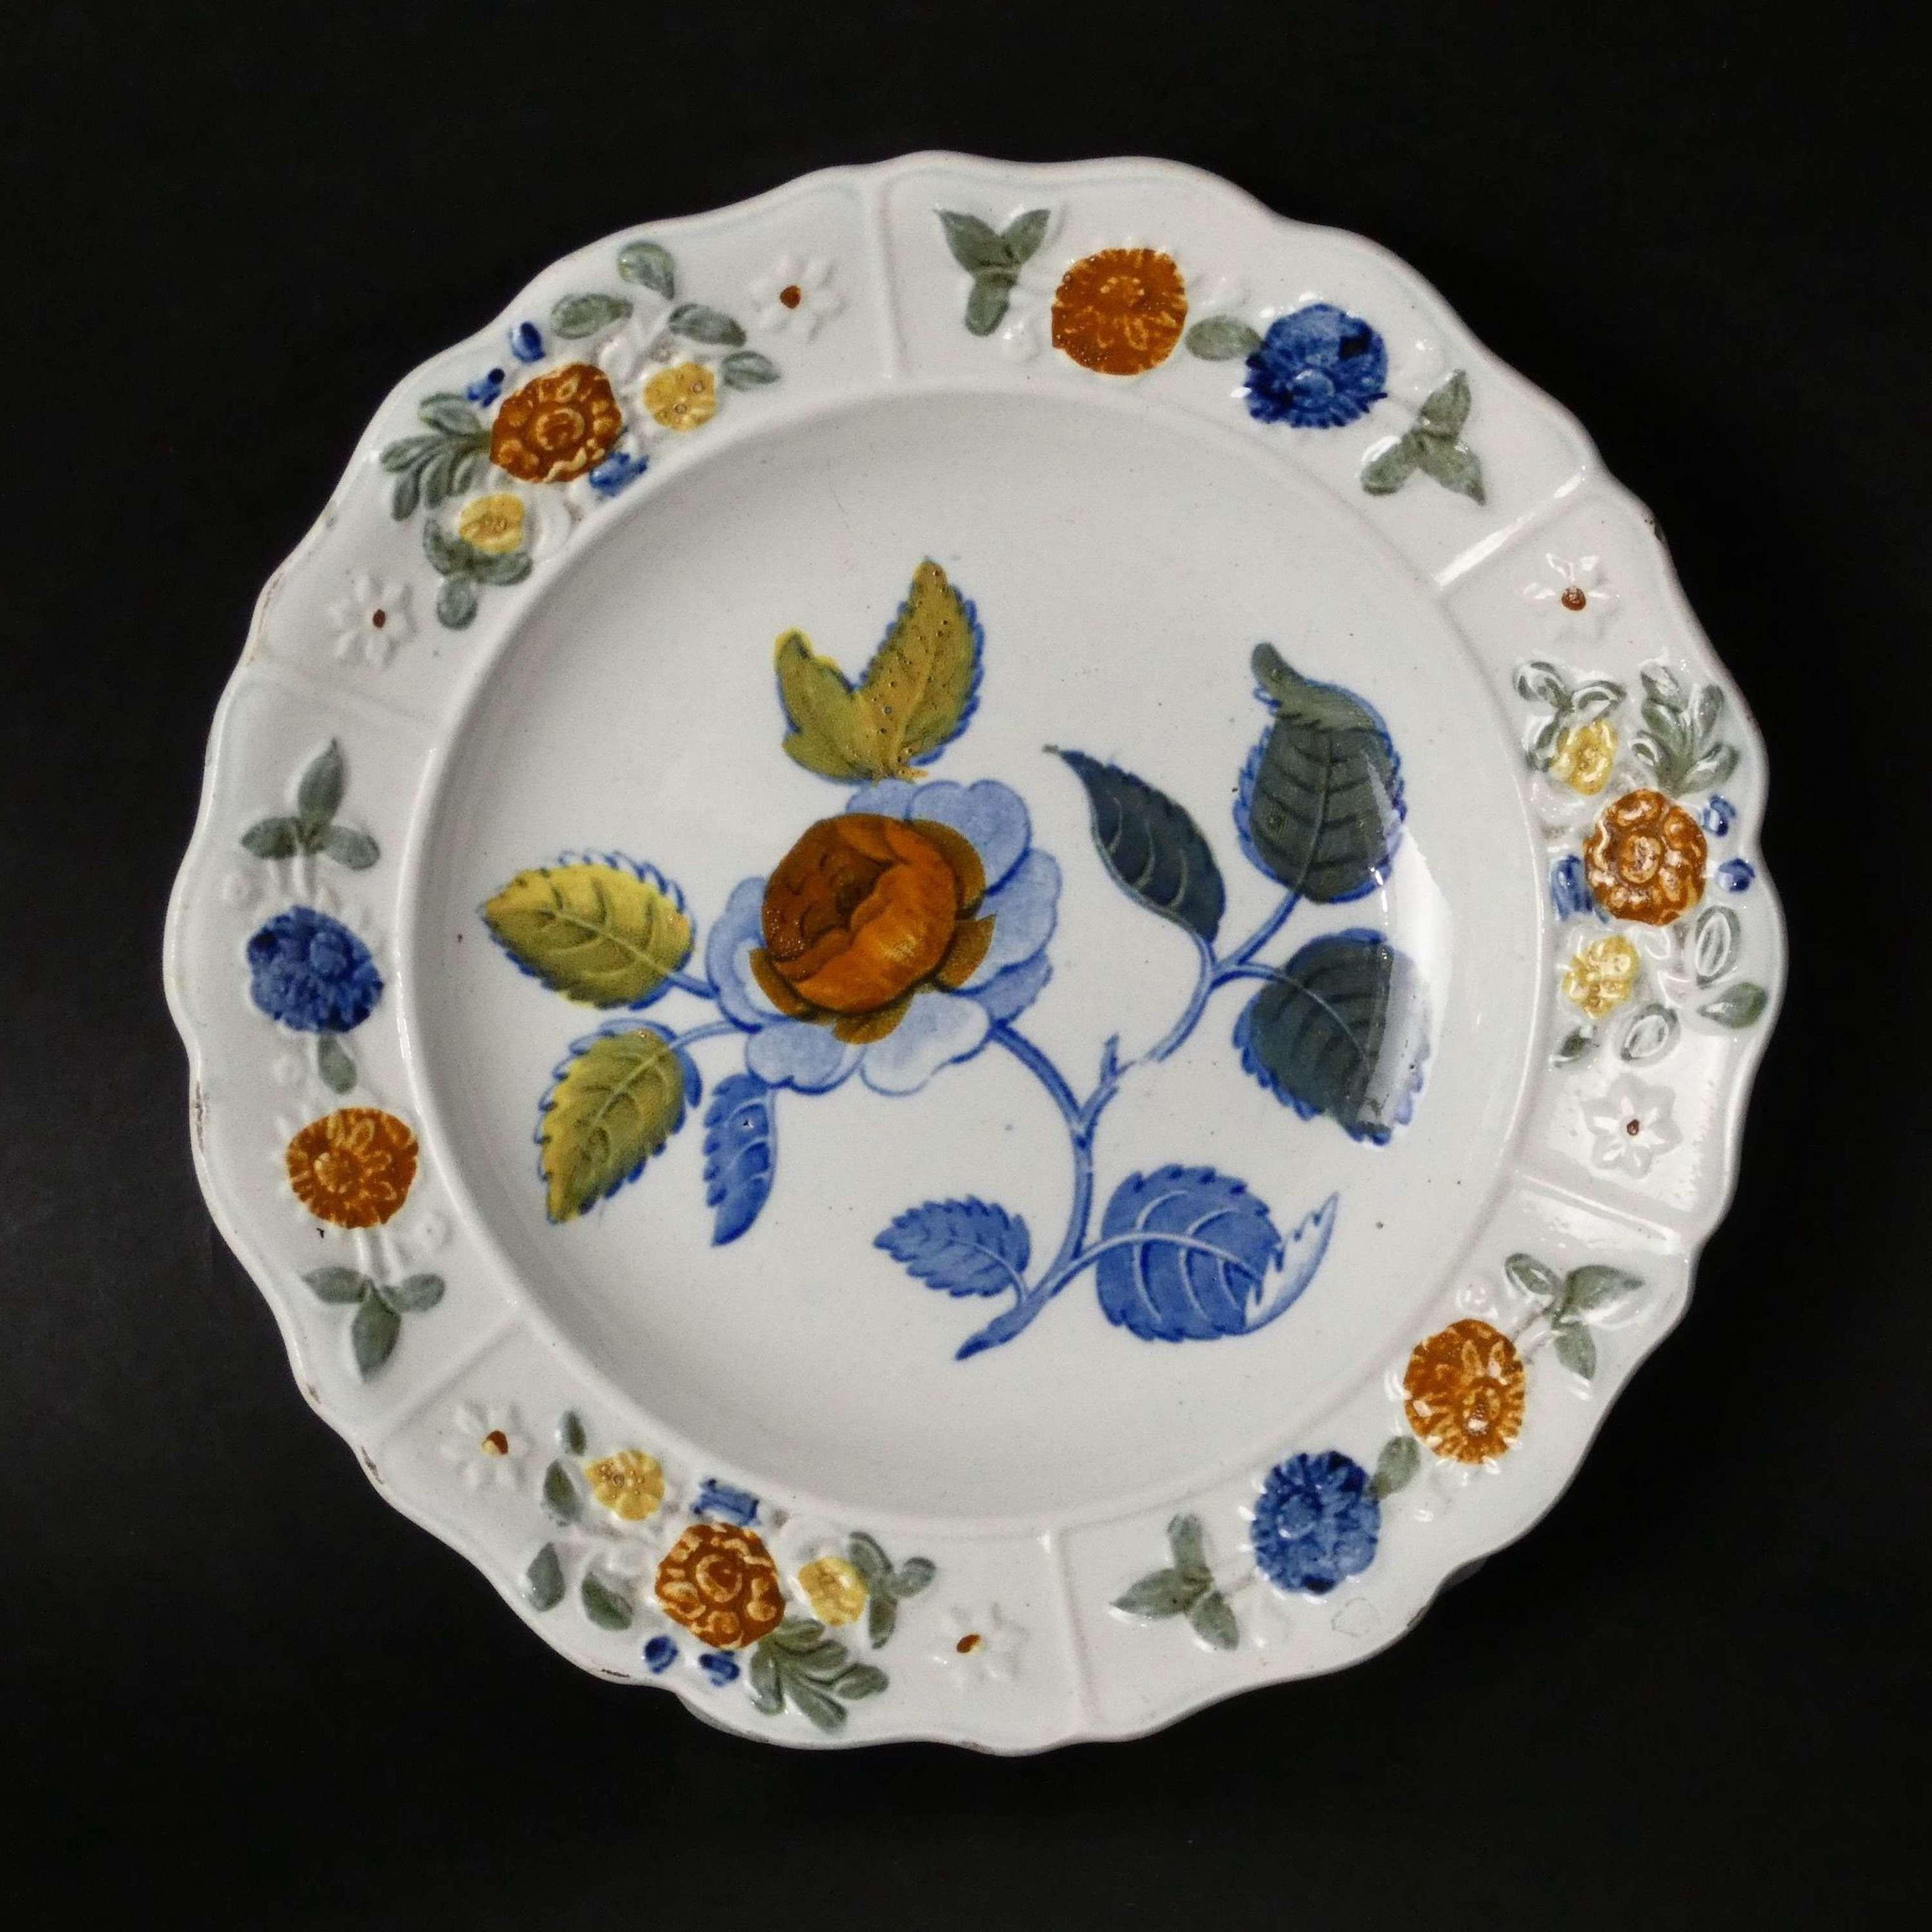 Prattware child's plate